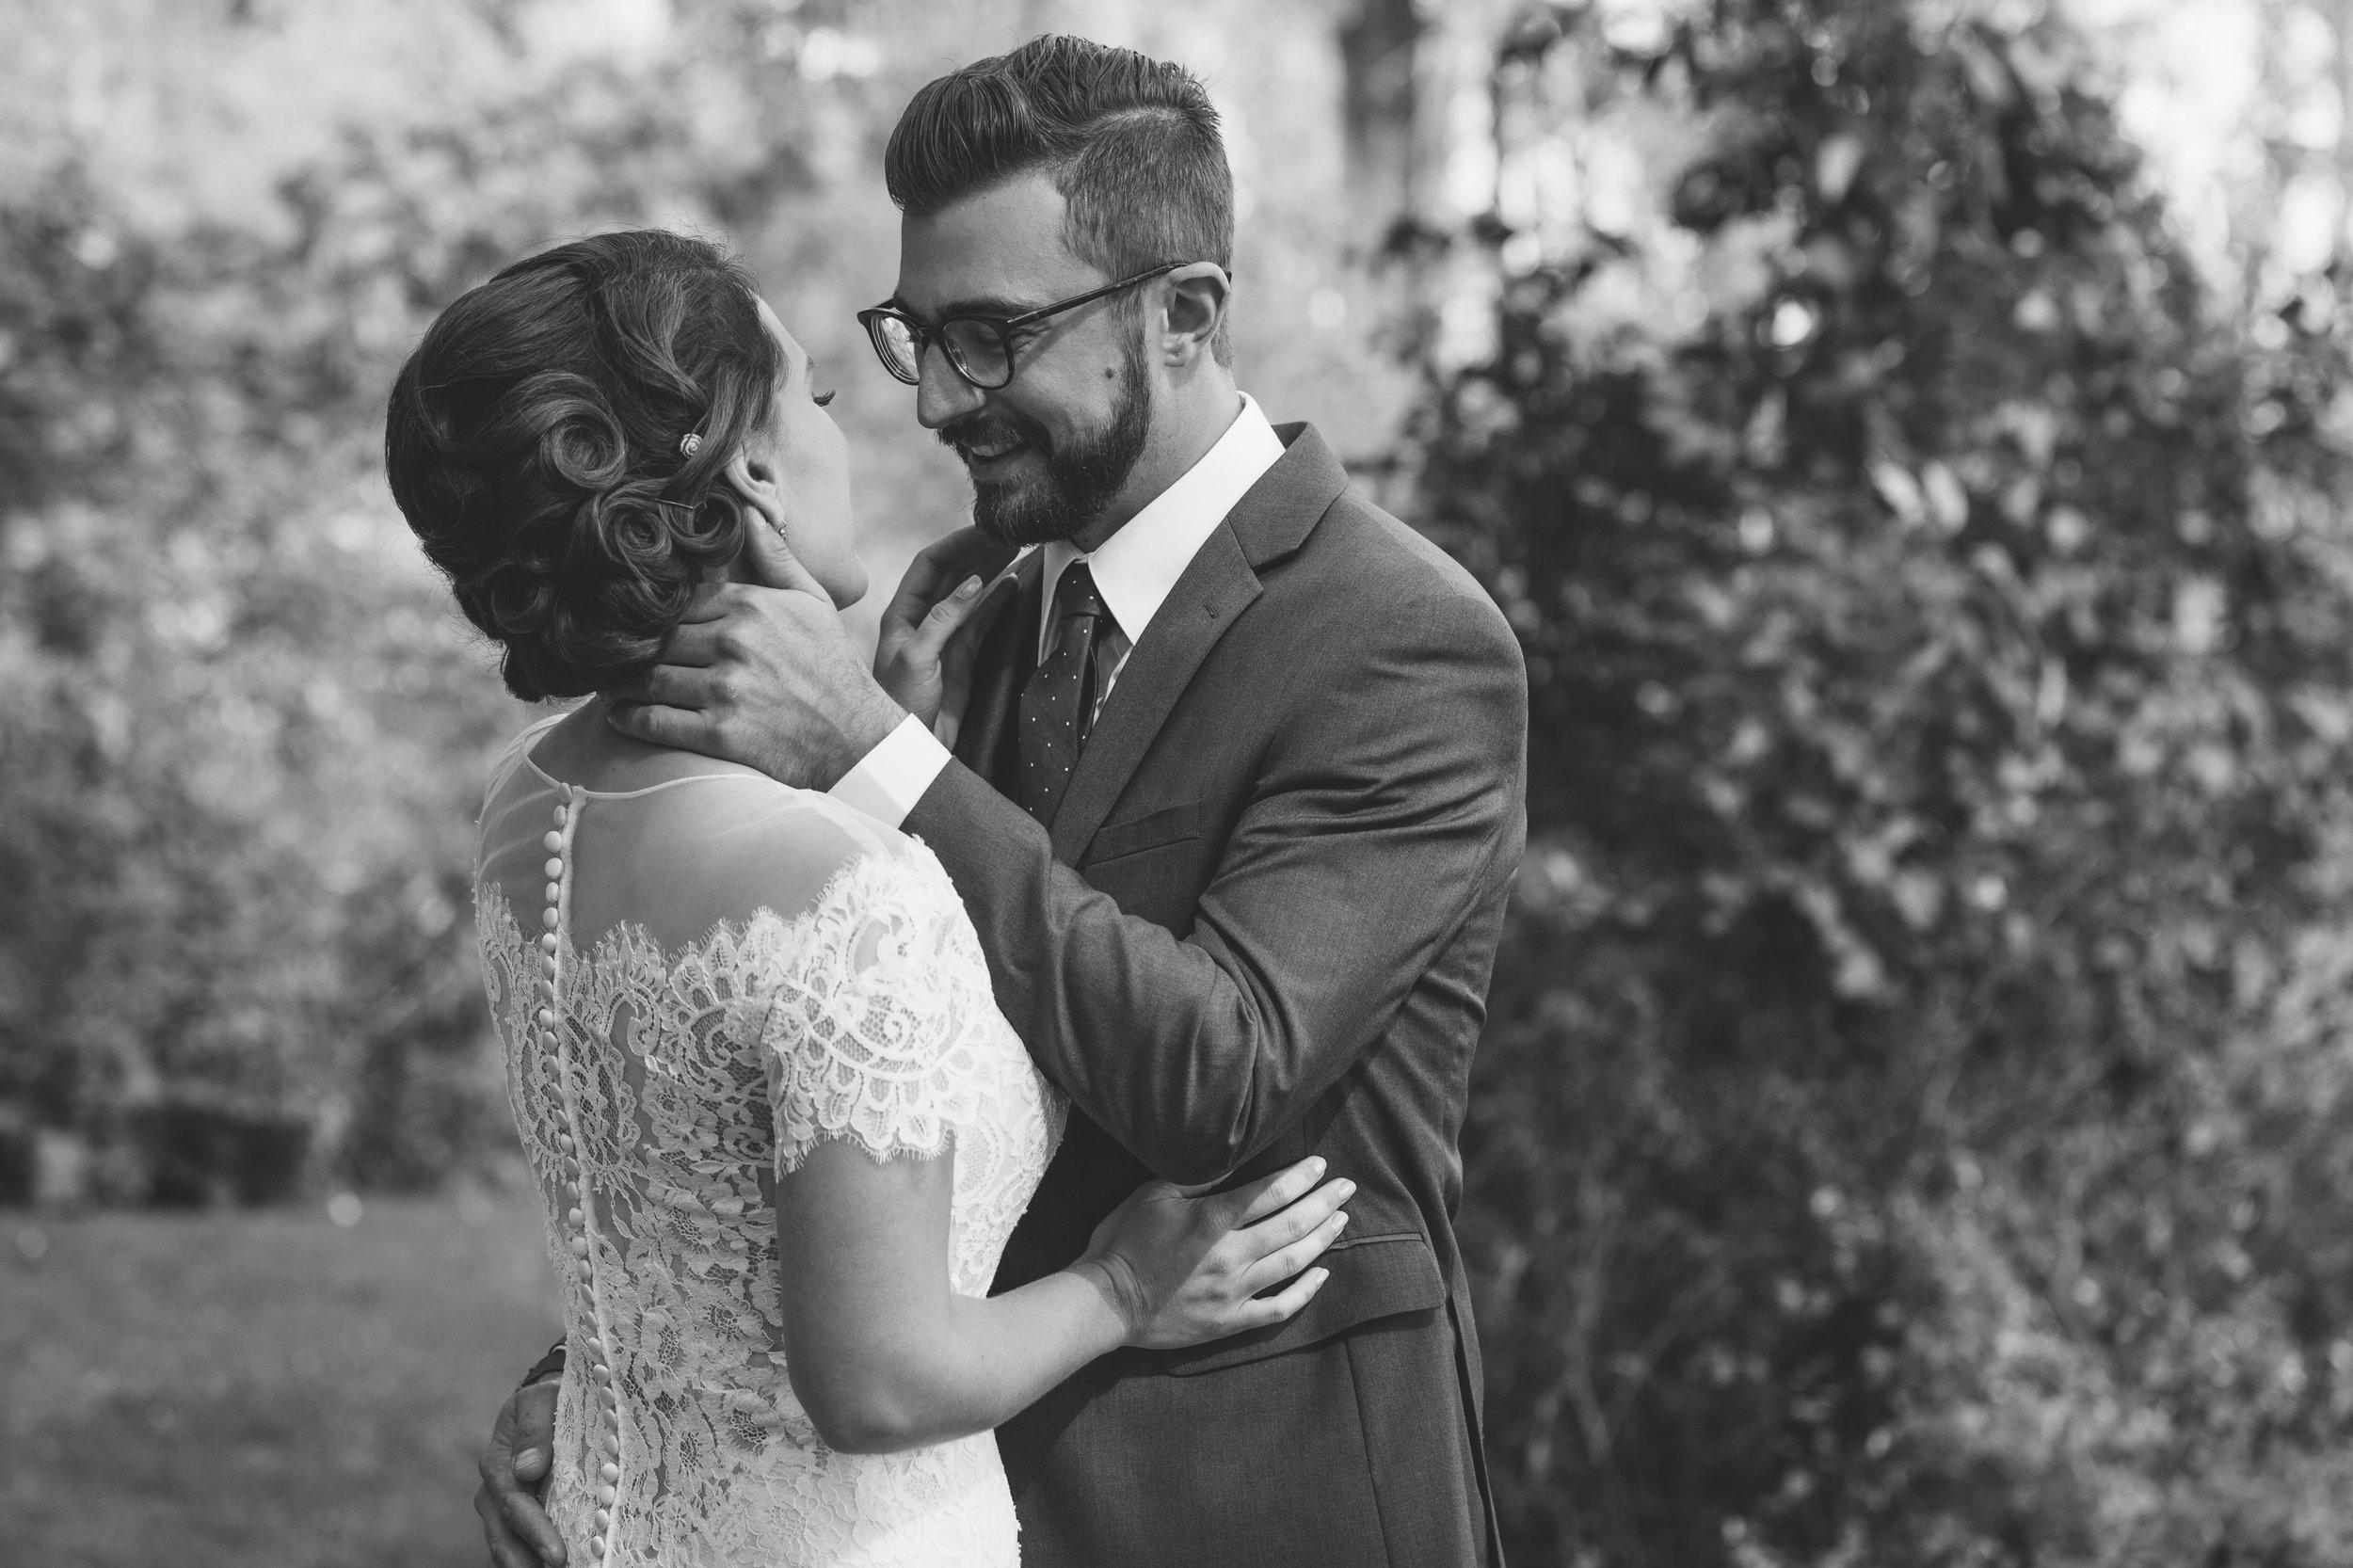 grand_rapids_wedding_rockford_wedding_richard_app_gallery_wedding_grand_rapids_wedding_photographer_summer_wedding_wabasis_lake_park_wedding_rustic_wedding-11.jpg